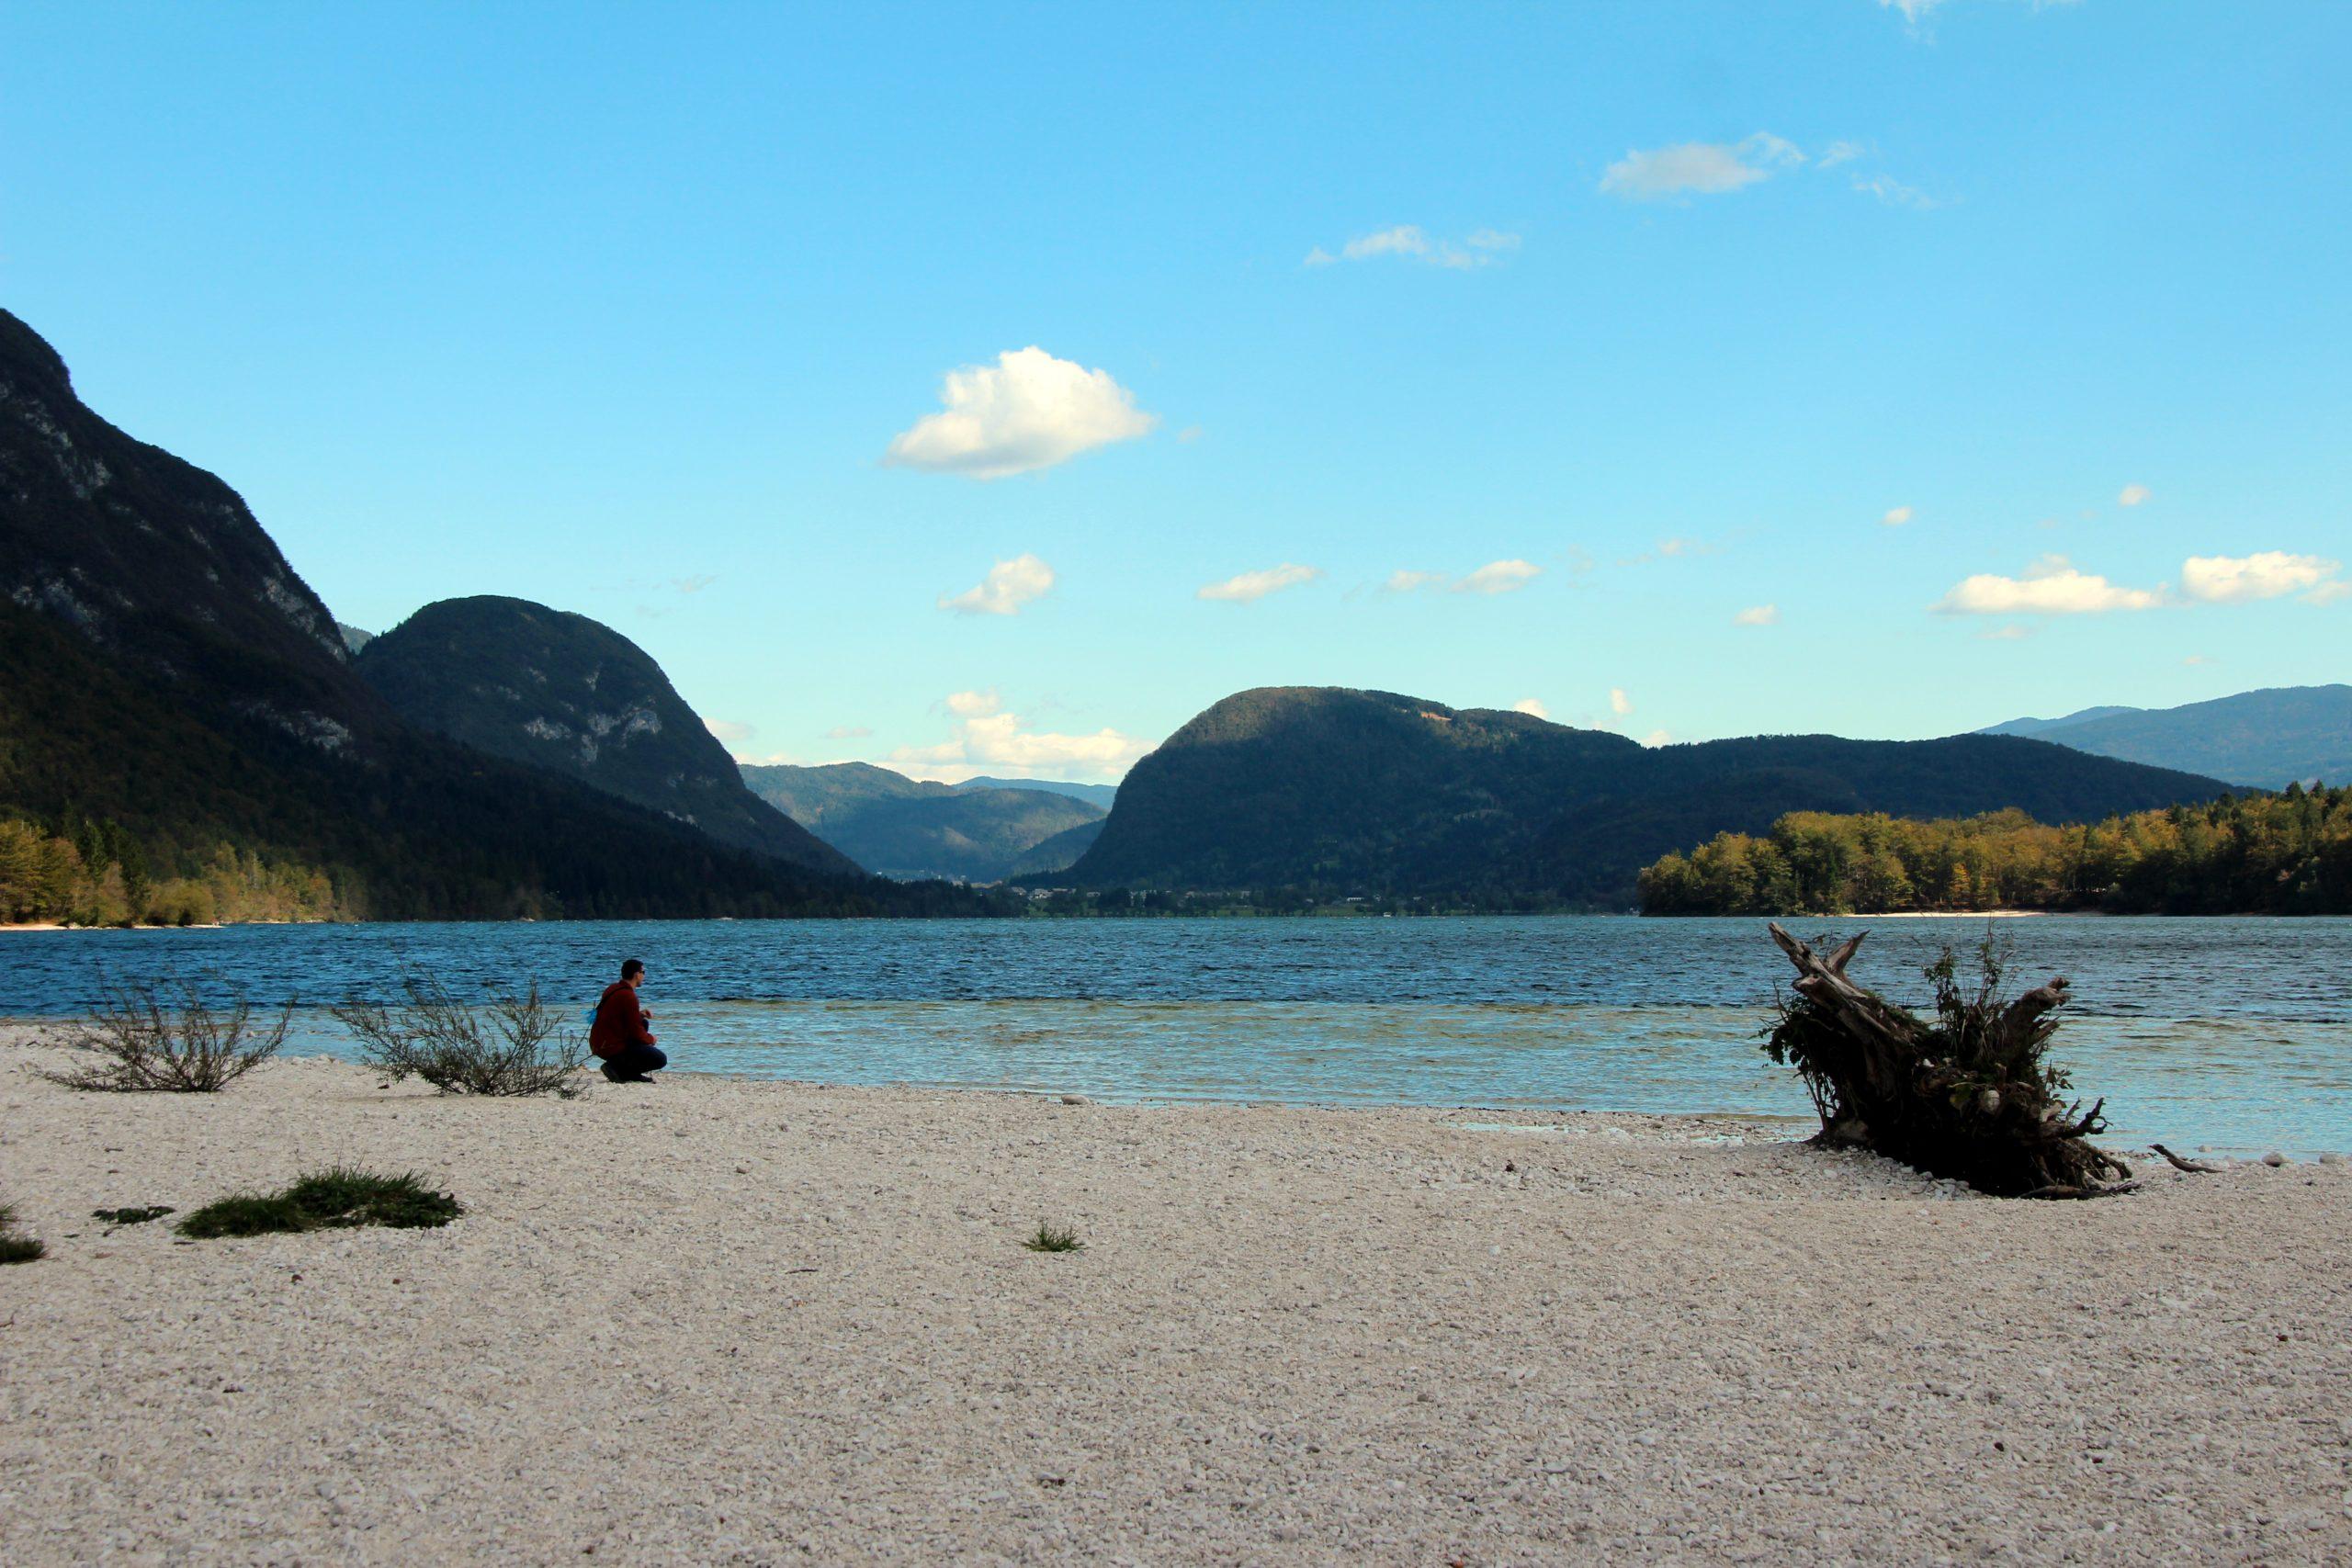 West Shoreline of Lake Bohinj in Slovenia